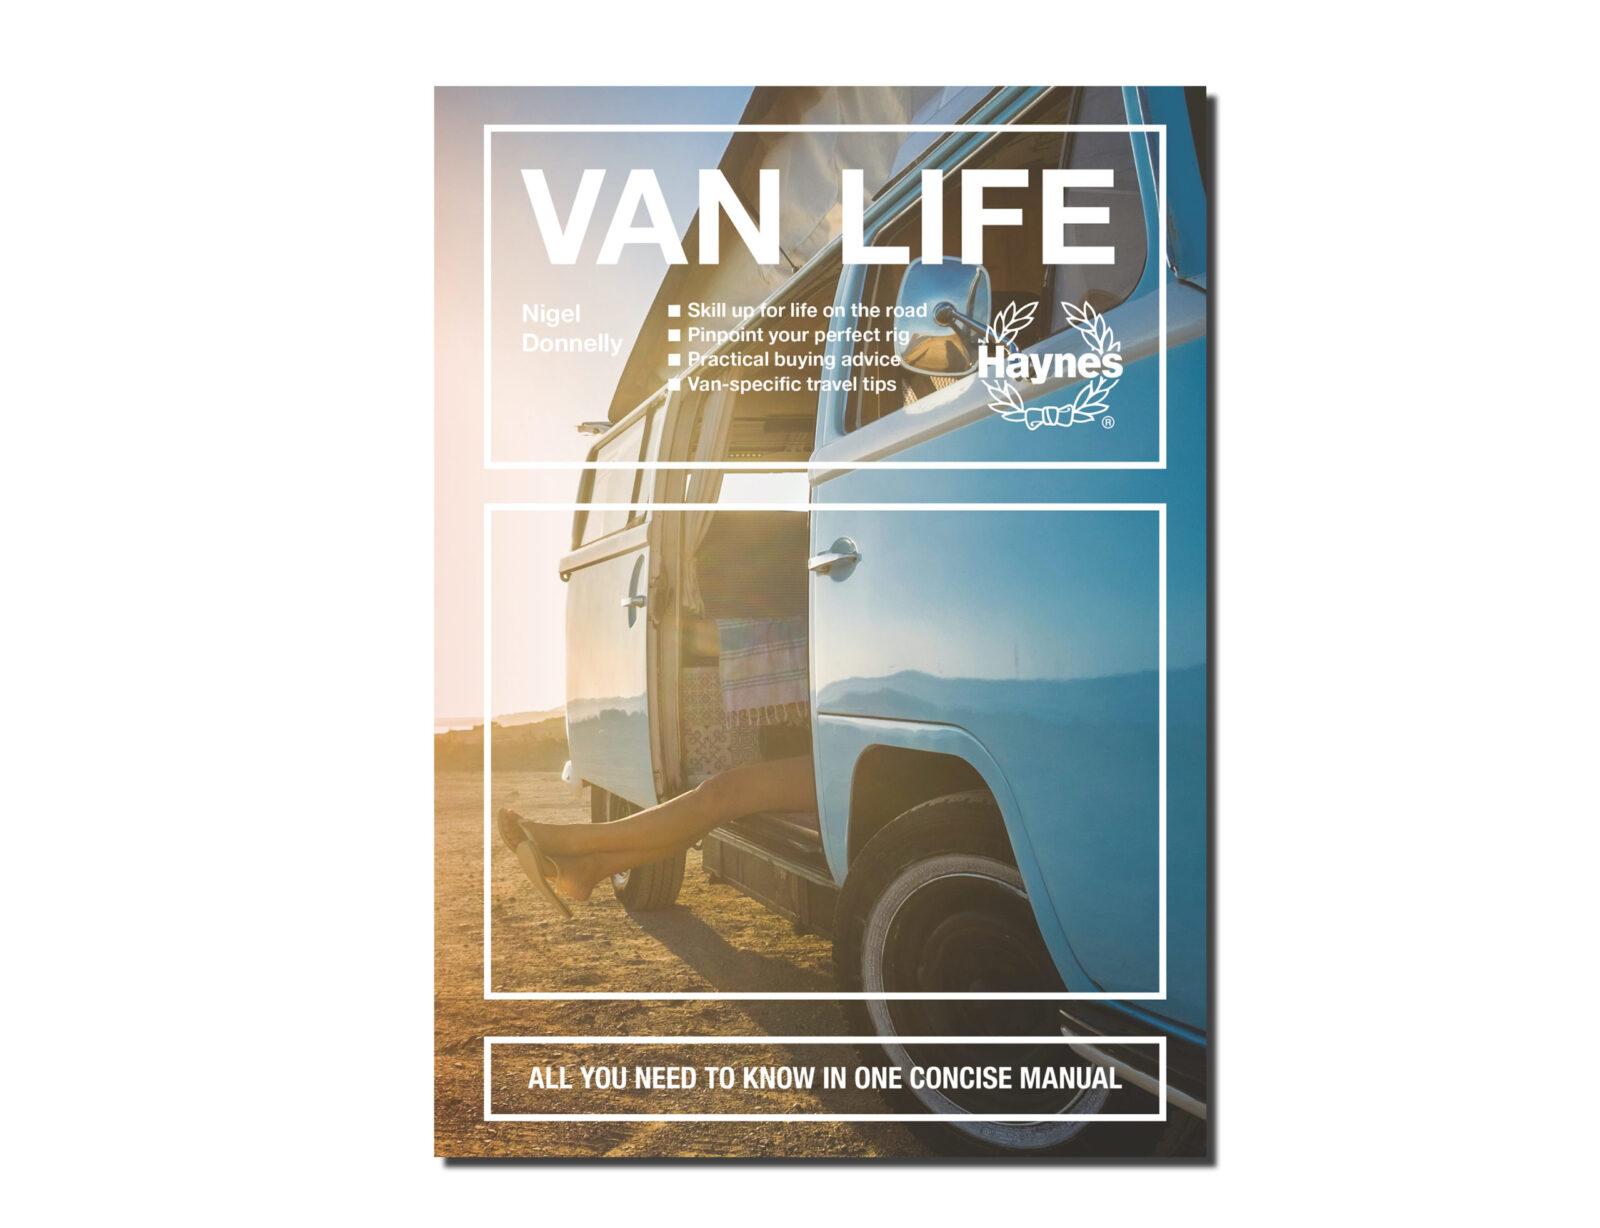 Van Life Haynes Book Cover